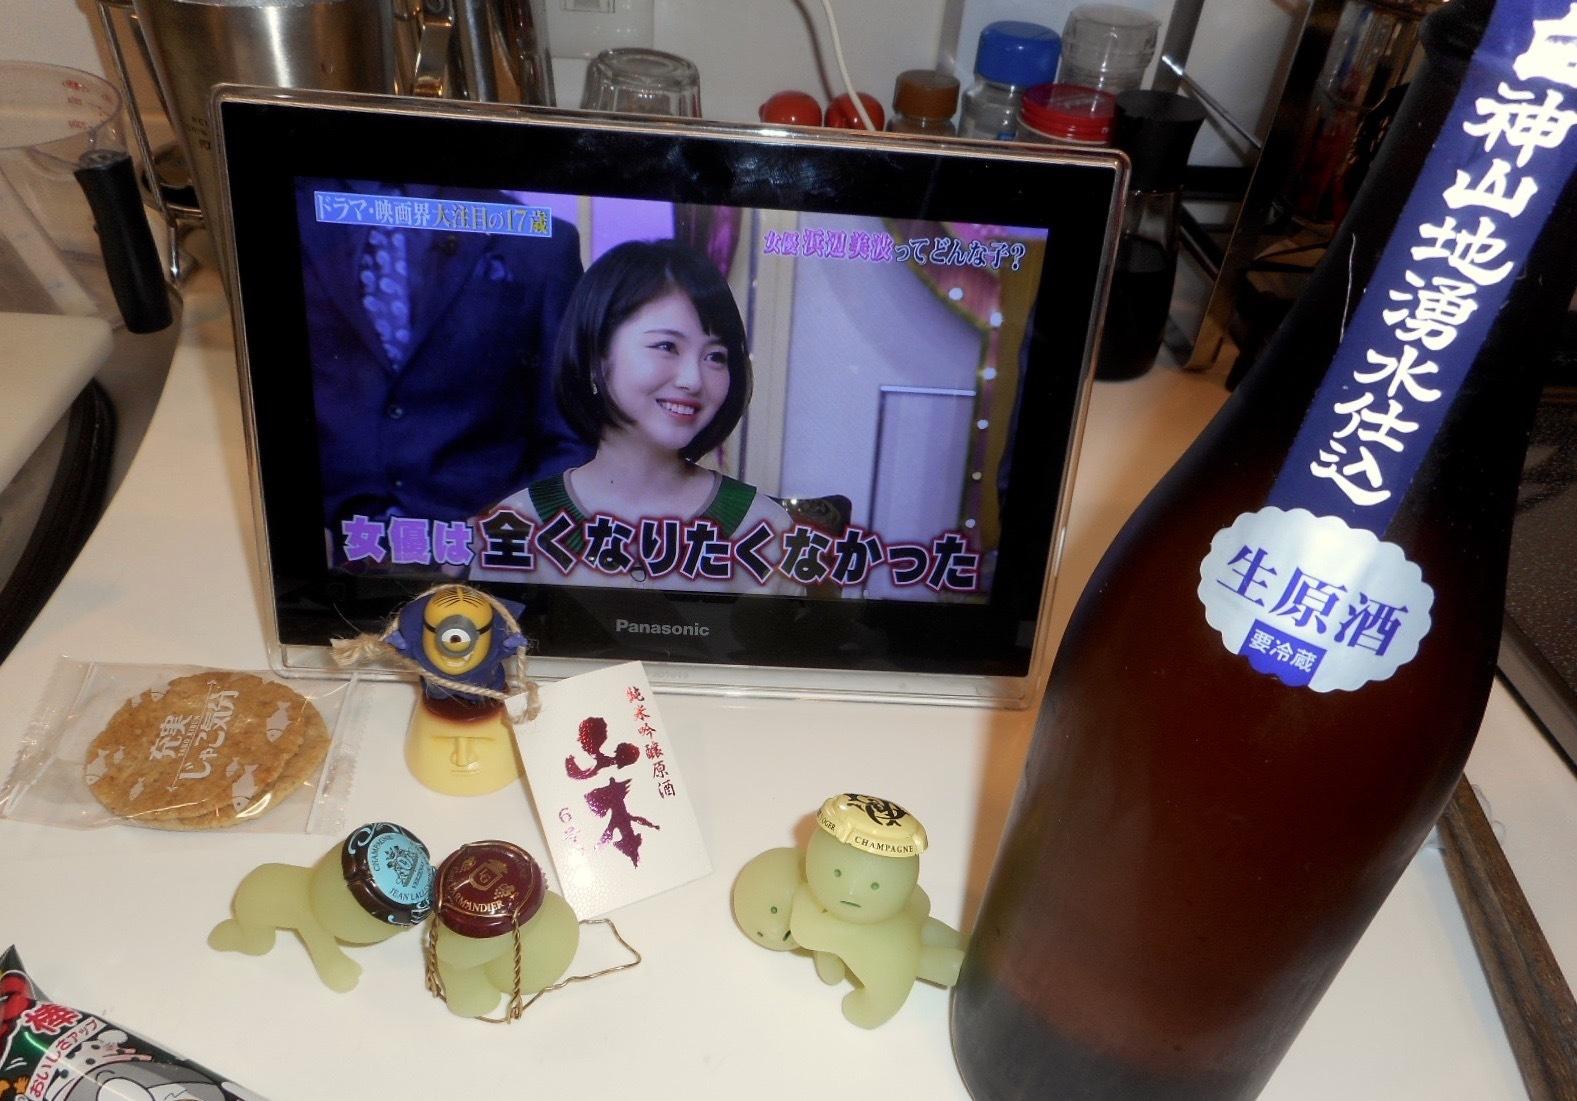 yamamoto_6gou29by3.jpg